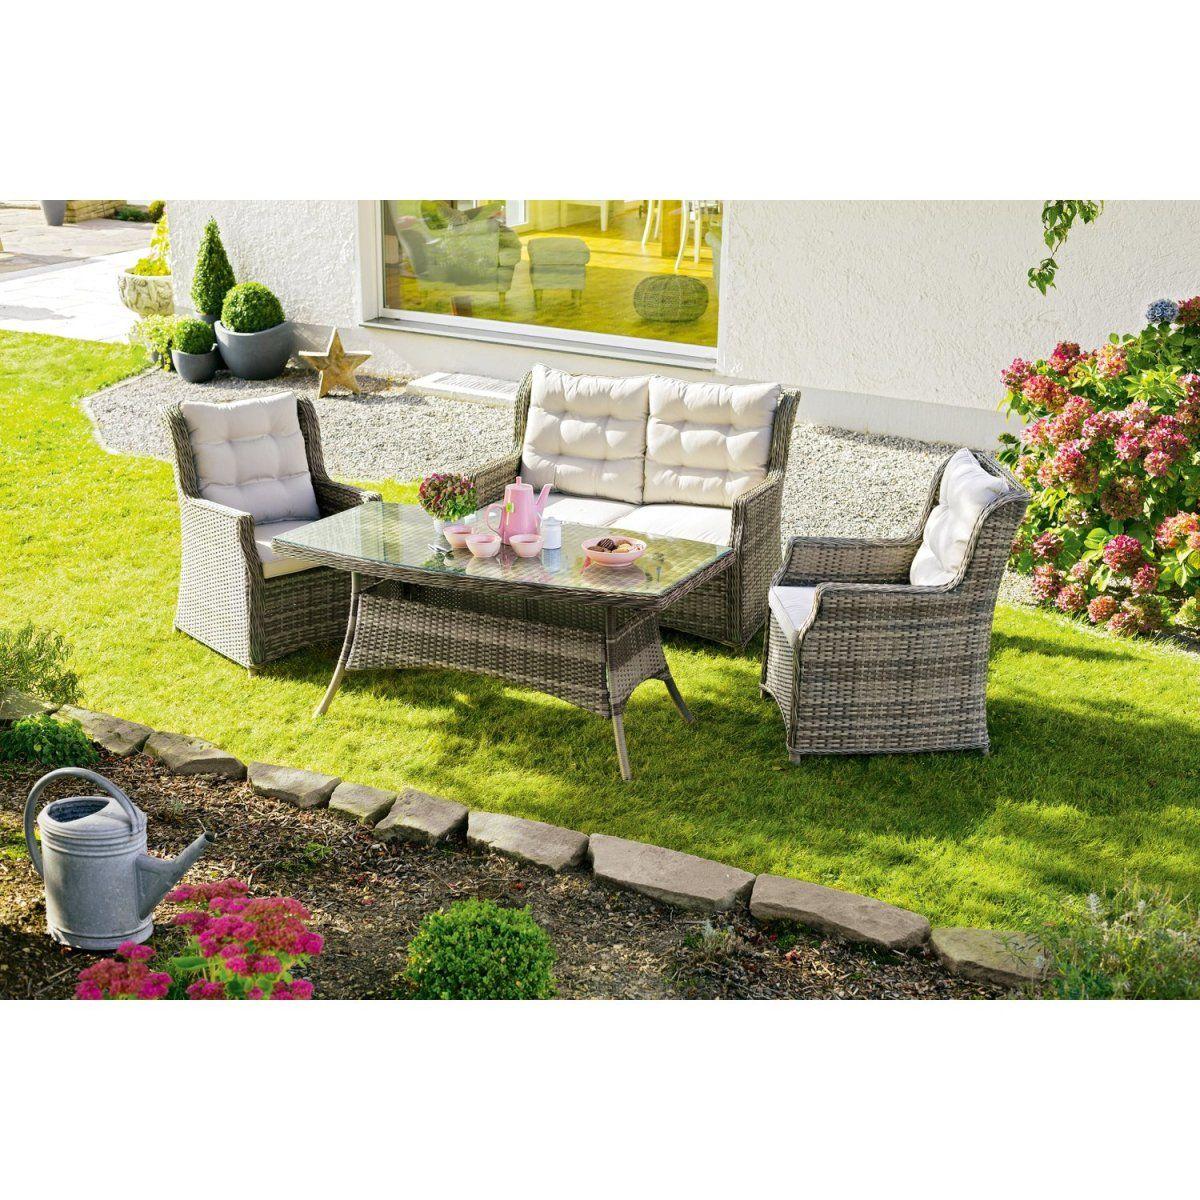 outdoor living gartenmobel obi, obi lounge-gruppe yorktown 4-teilig jetzt bestellen unter: https, Design ideen